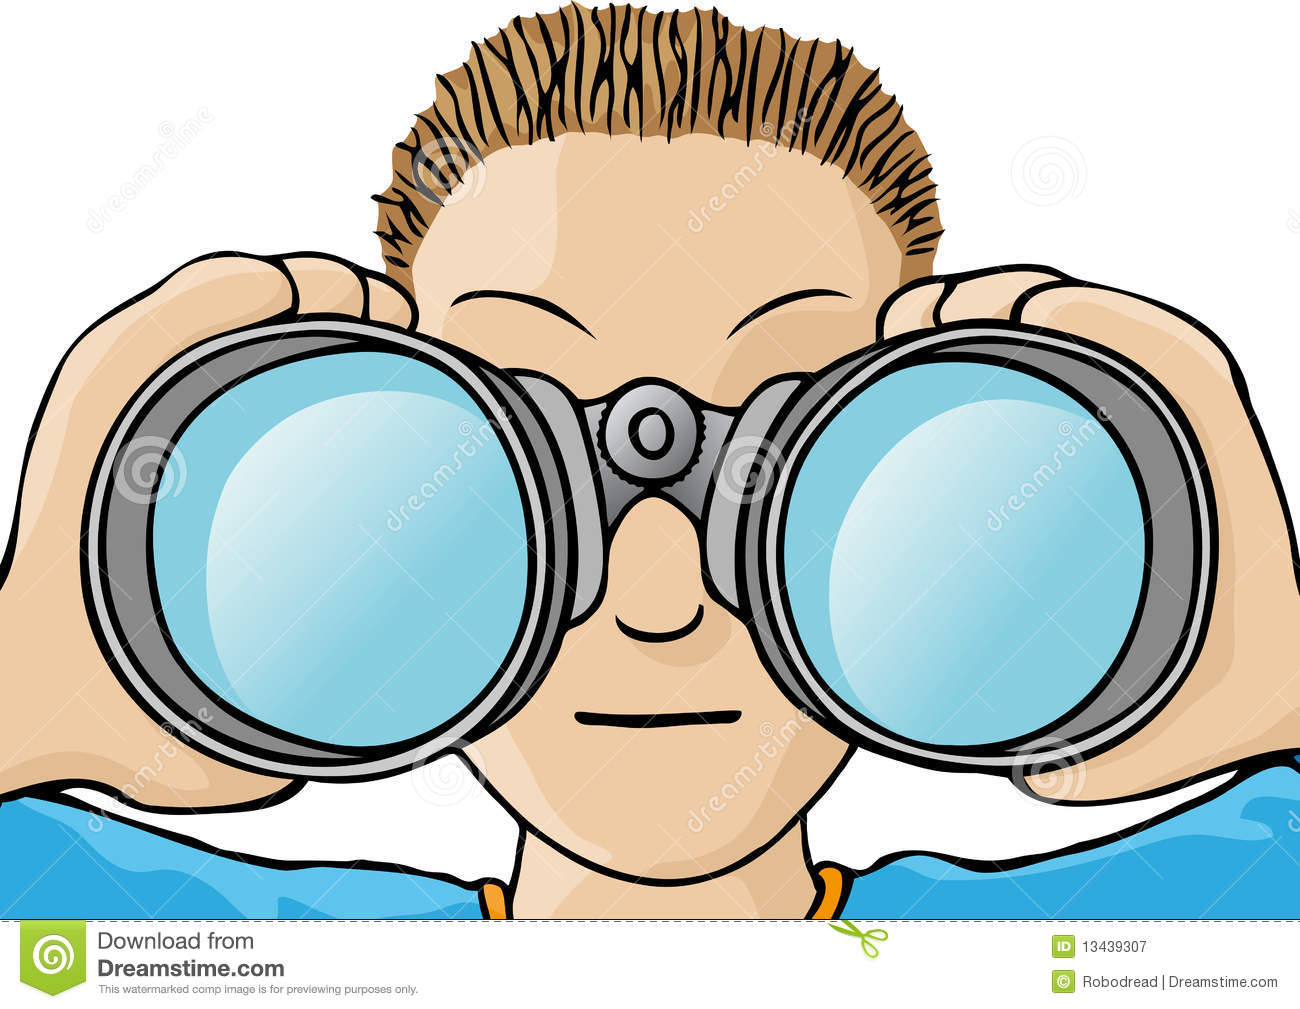 793 Binoculars free clipart.